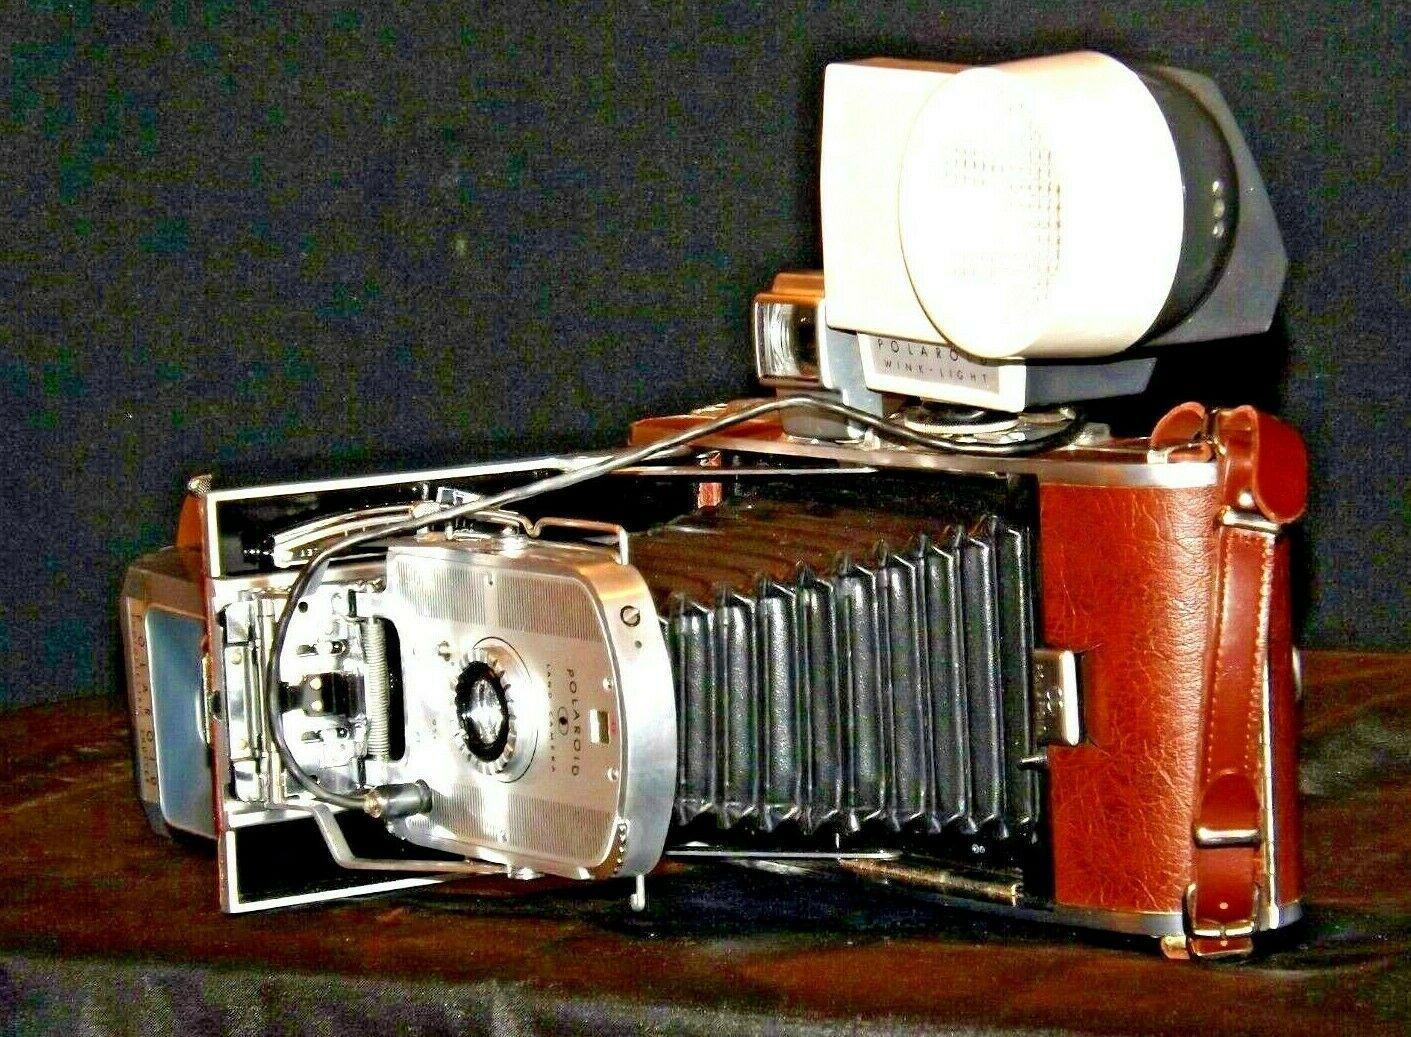 Polaroid Land Camera Model 95B USA AA19-1606 Antique